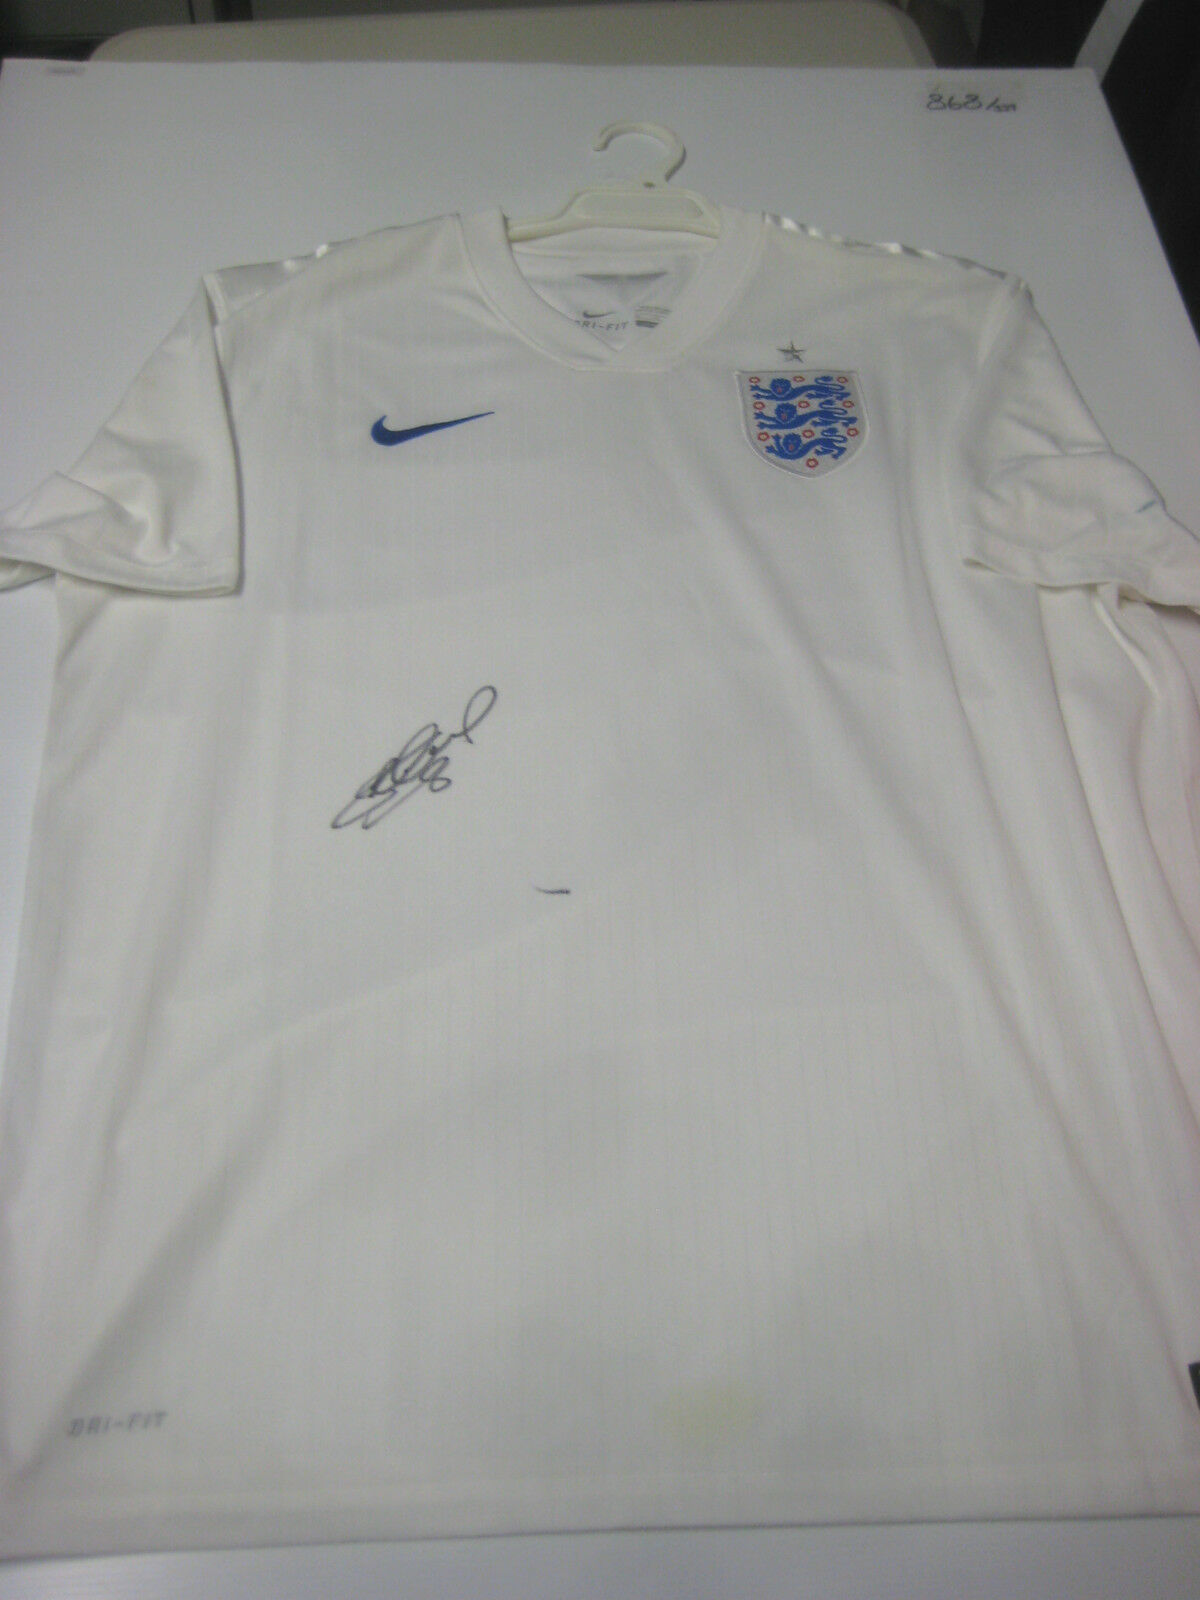 Inglaterra-Steven Gerrard Firmado Inglaterra Camiseta + + prueba fotográfica C.o.a